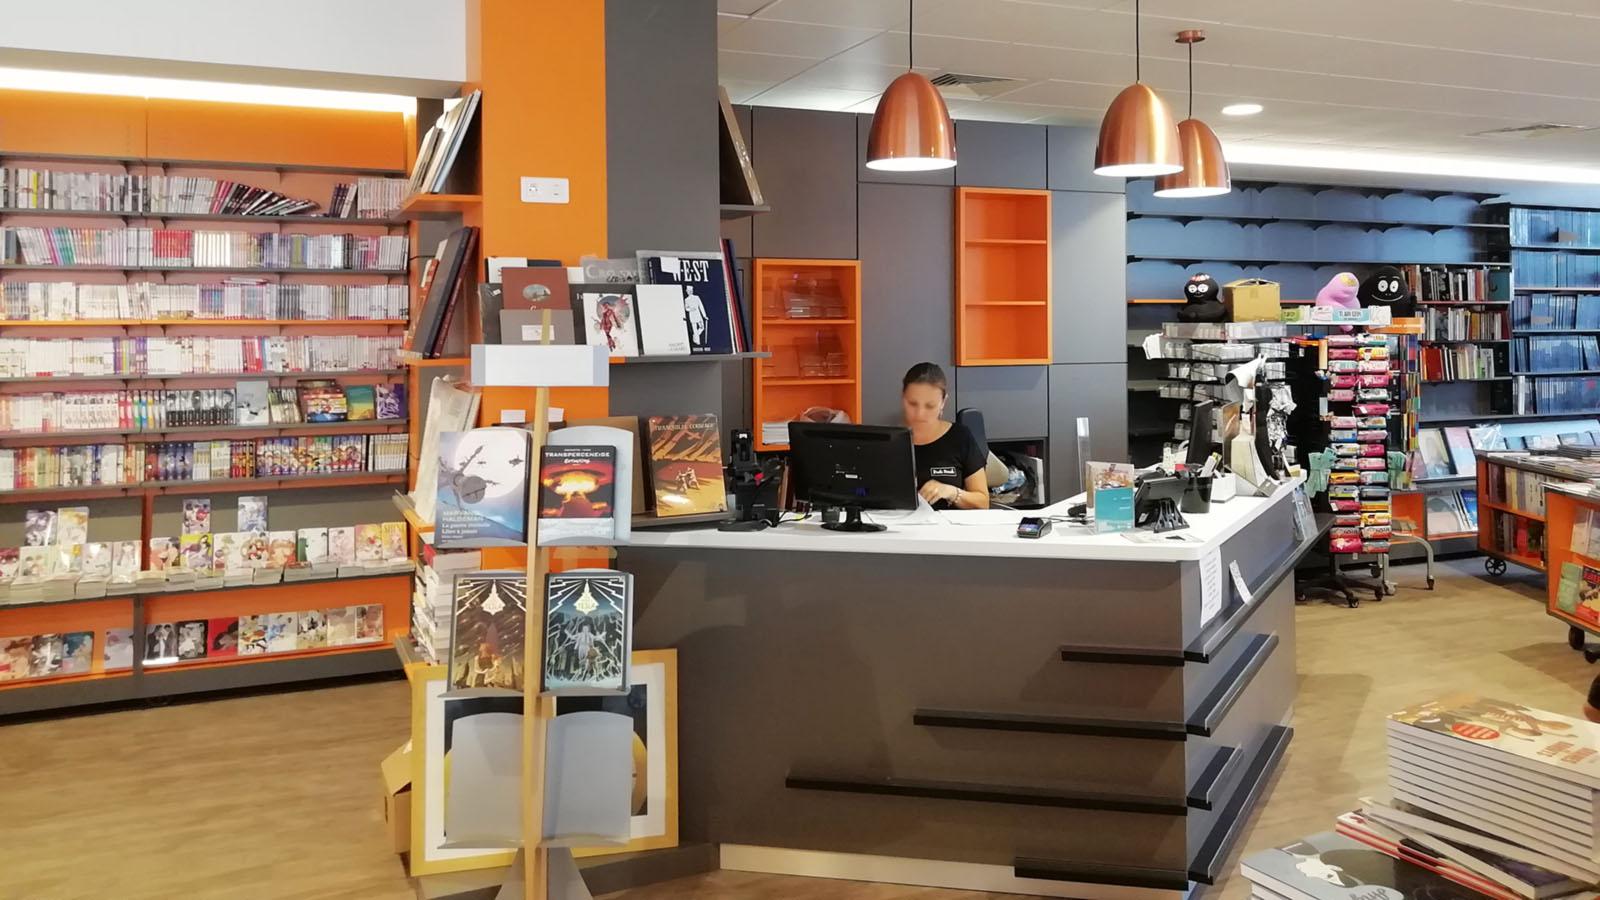 EFI Design EFI Design Librairie La Roche Sur Yon (54) 1383